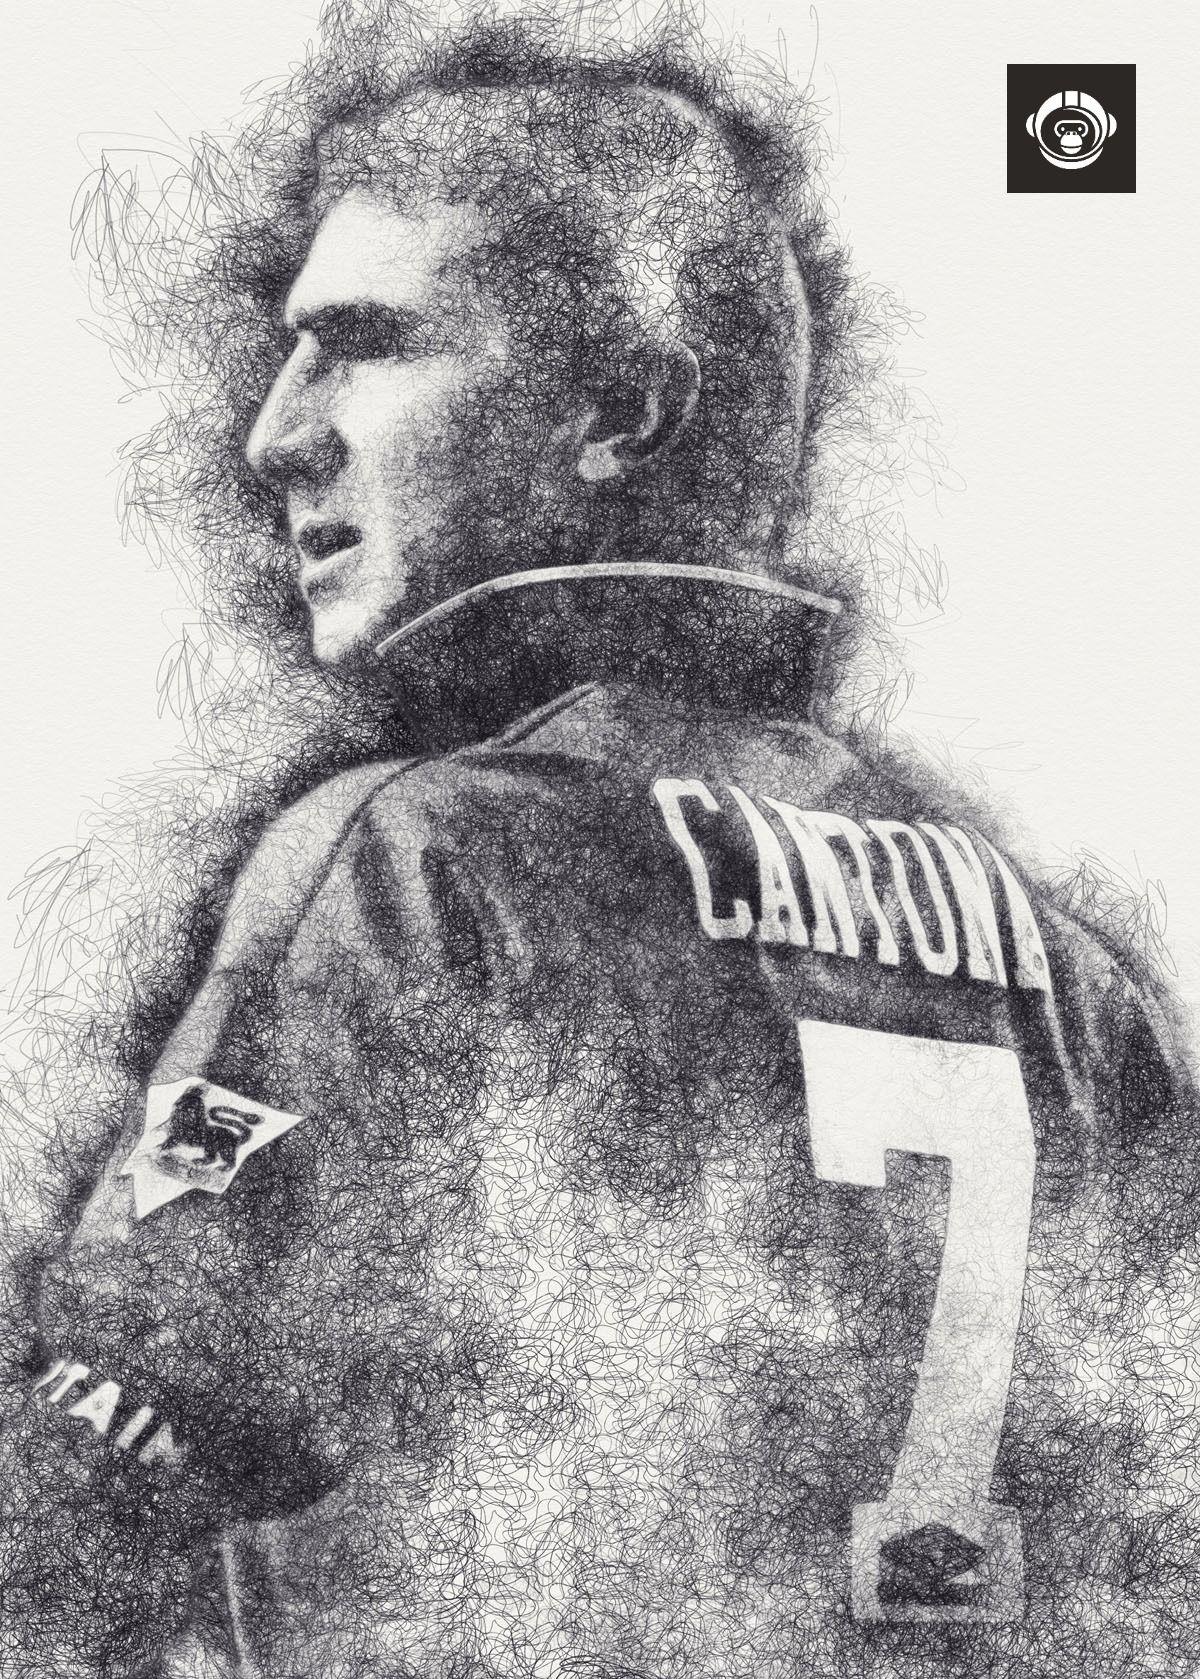 Wallpaper eric cantona puzzle (18 x 24 (500 pieces)) by sono sini. Eric Cantona | Eric cantona, Manchester united art ...